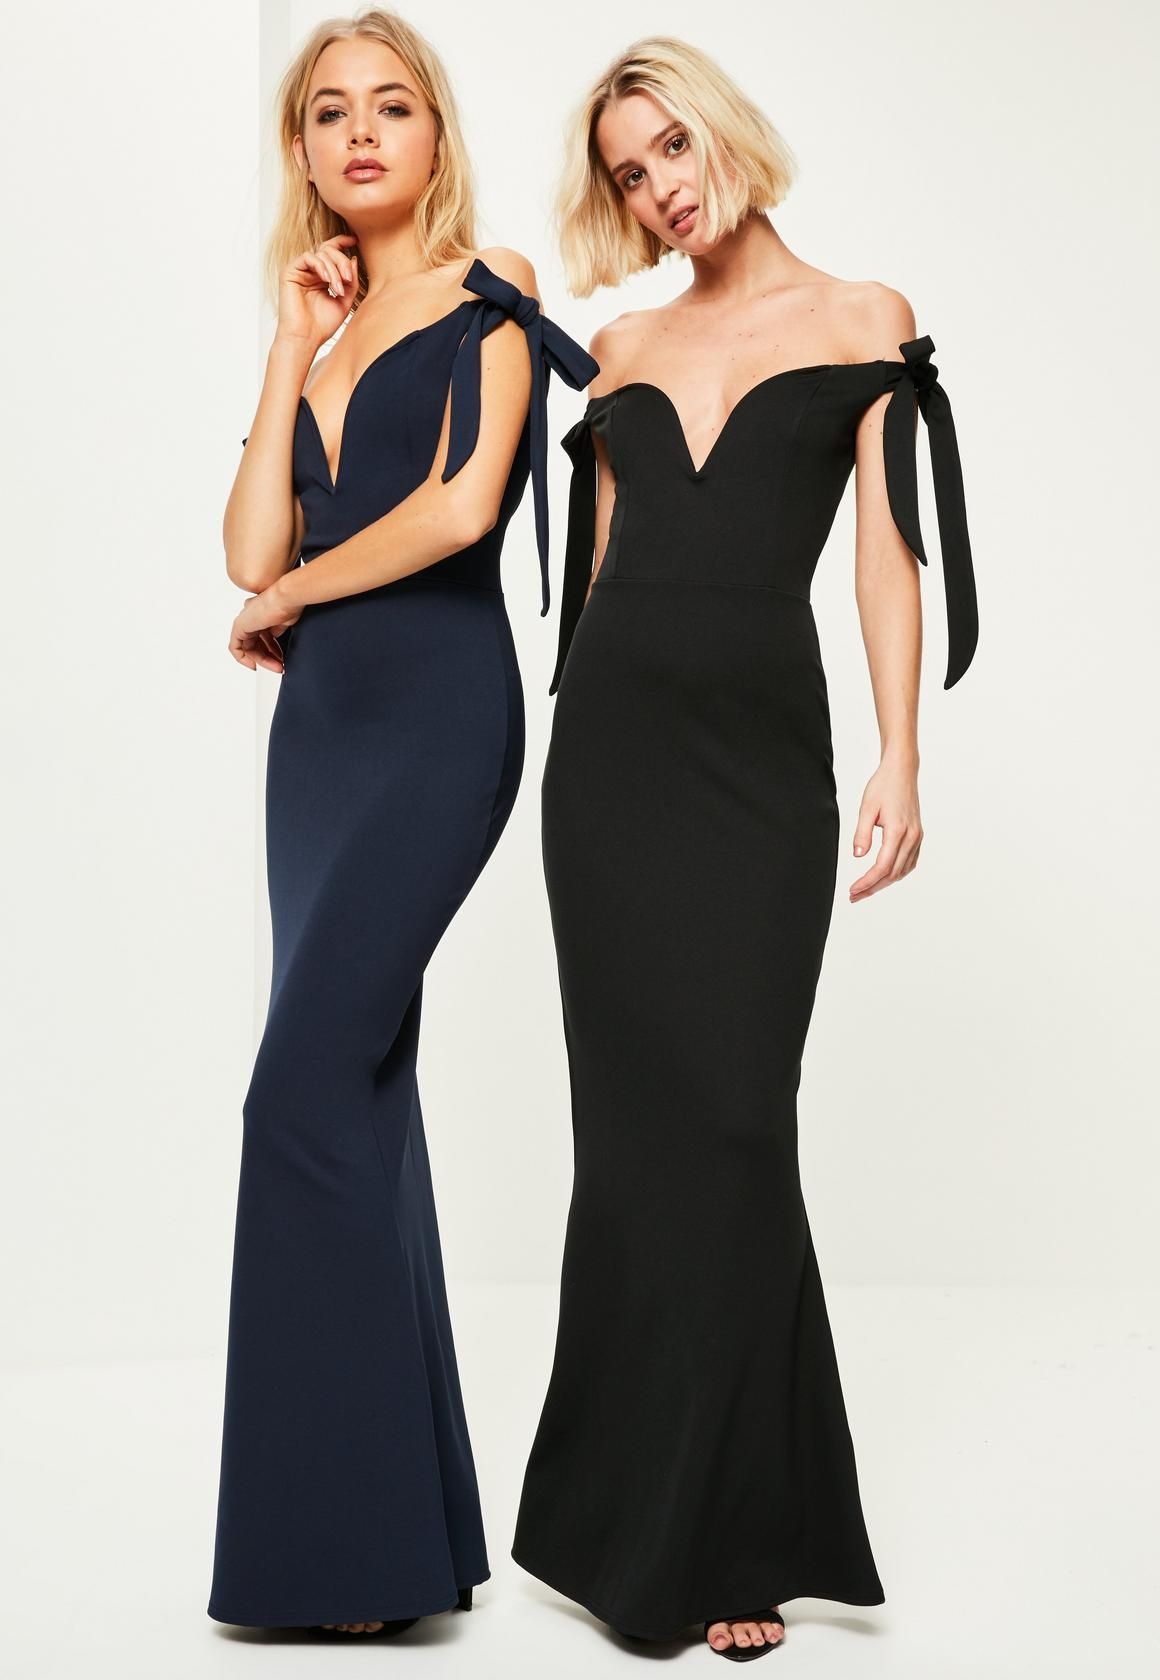 Missguided Navy Crepe Sweetheart Neck Bardot Tie Maxi Dress Women Dress Online Womens Dresses Dresses [ 1680 x 1160 Pixel ]